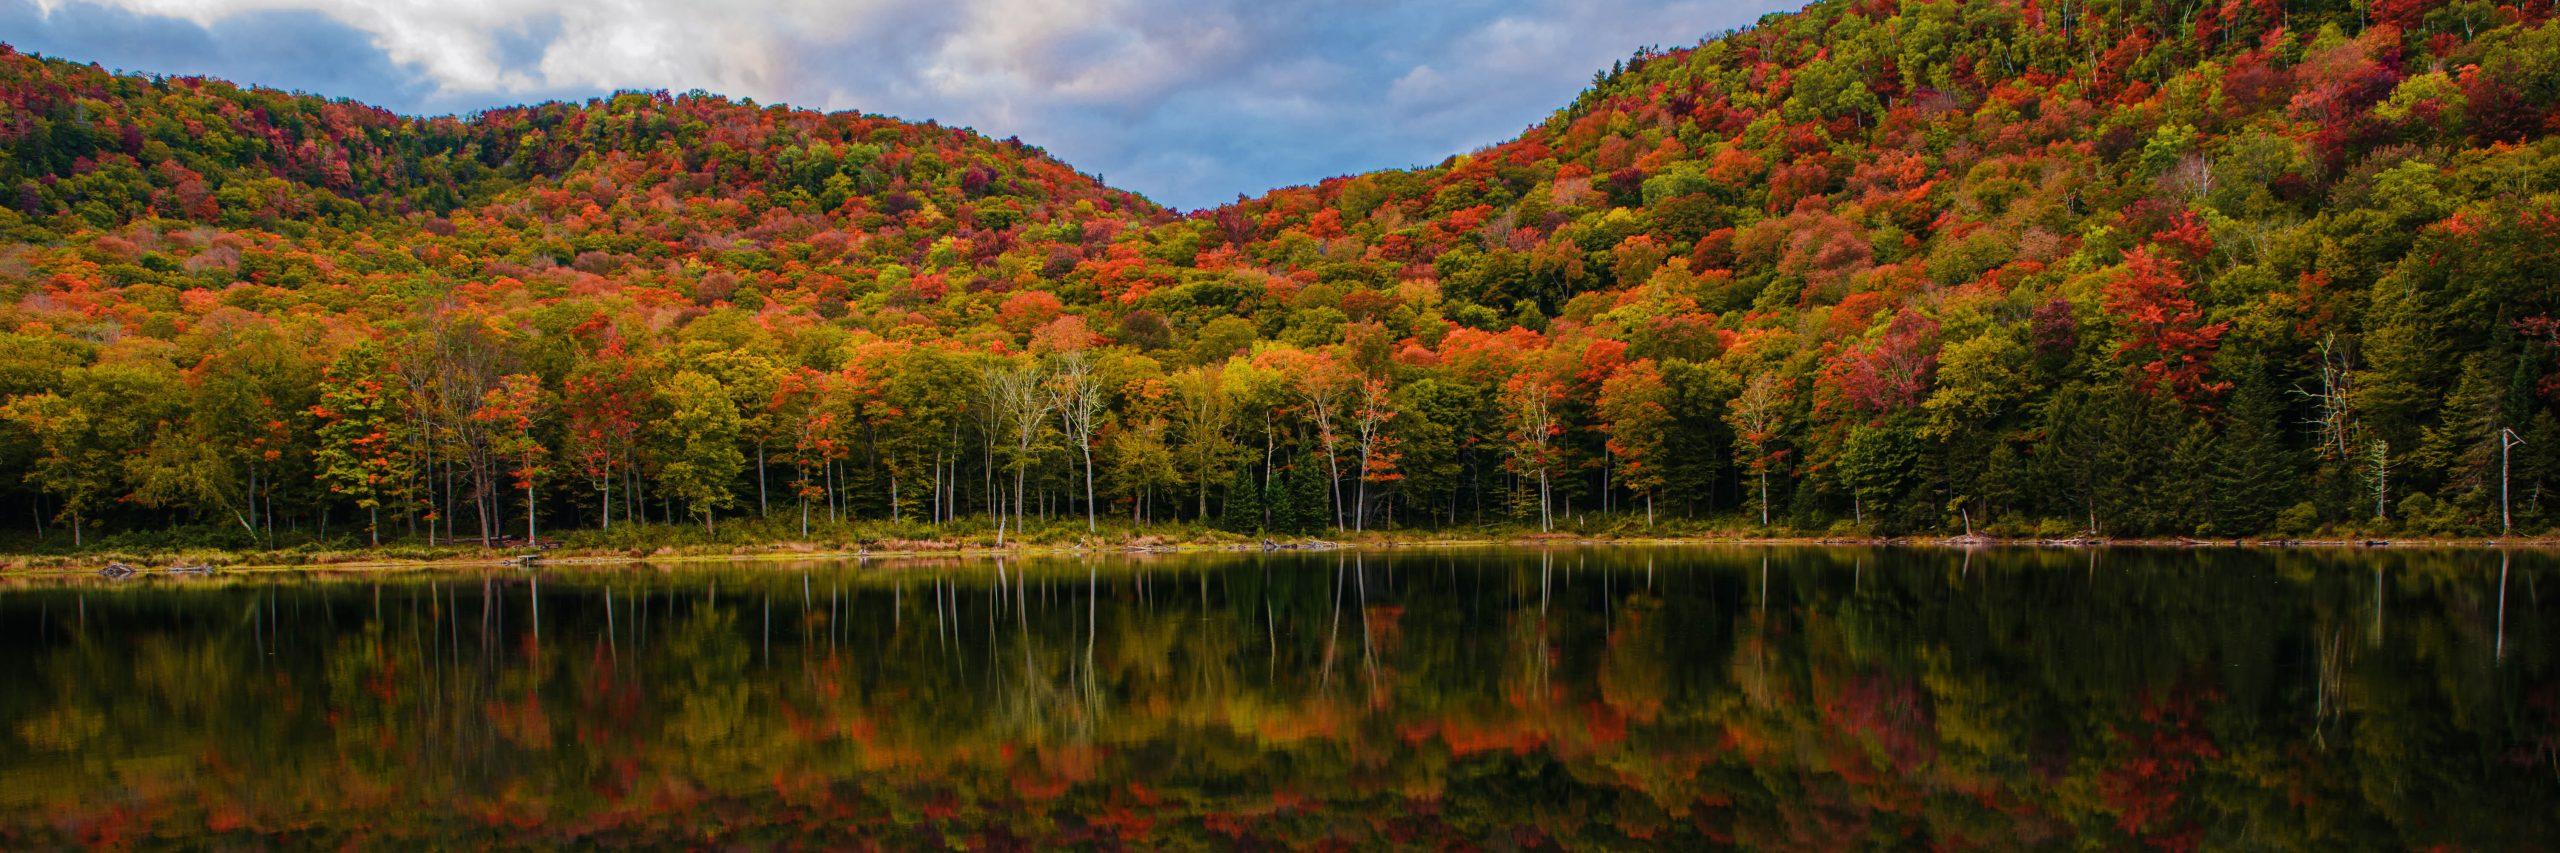 Fall leaves at Eden Pond